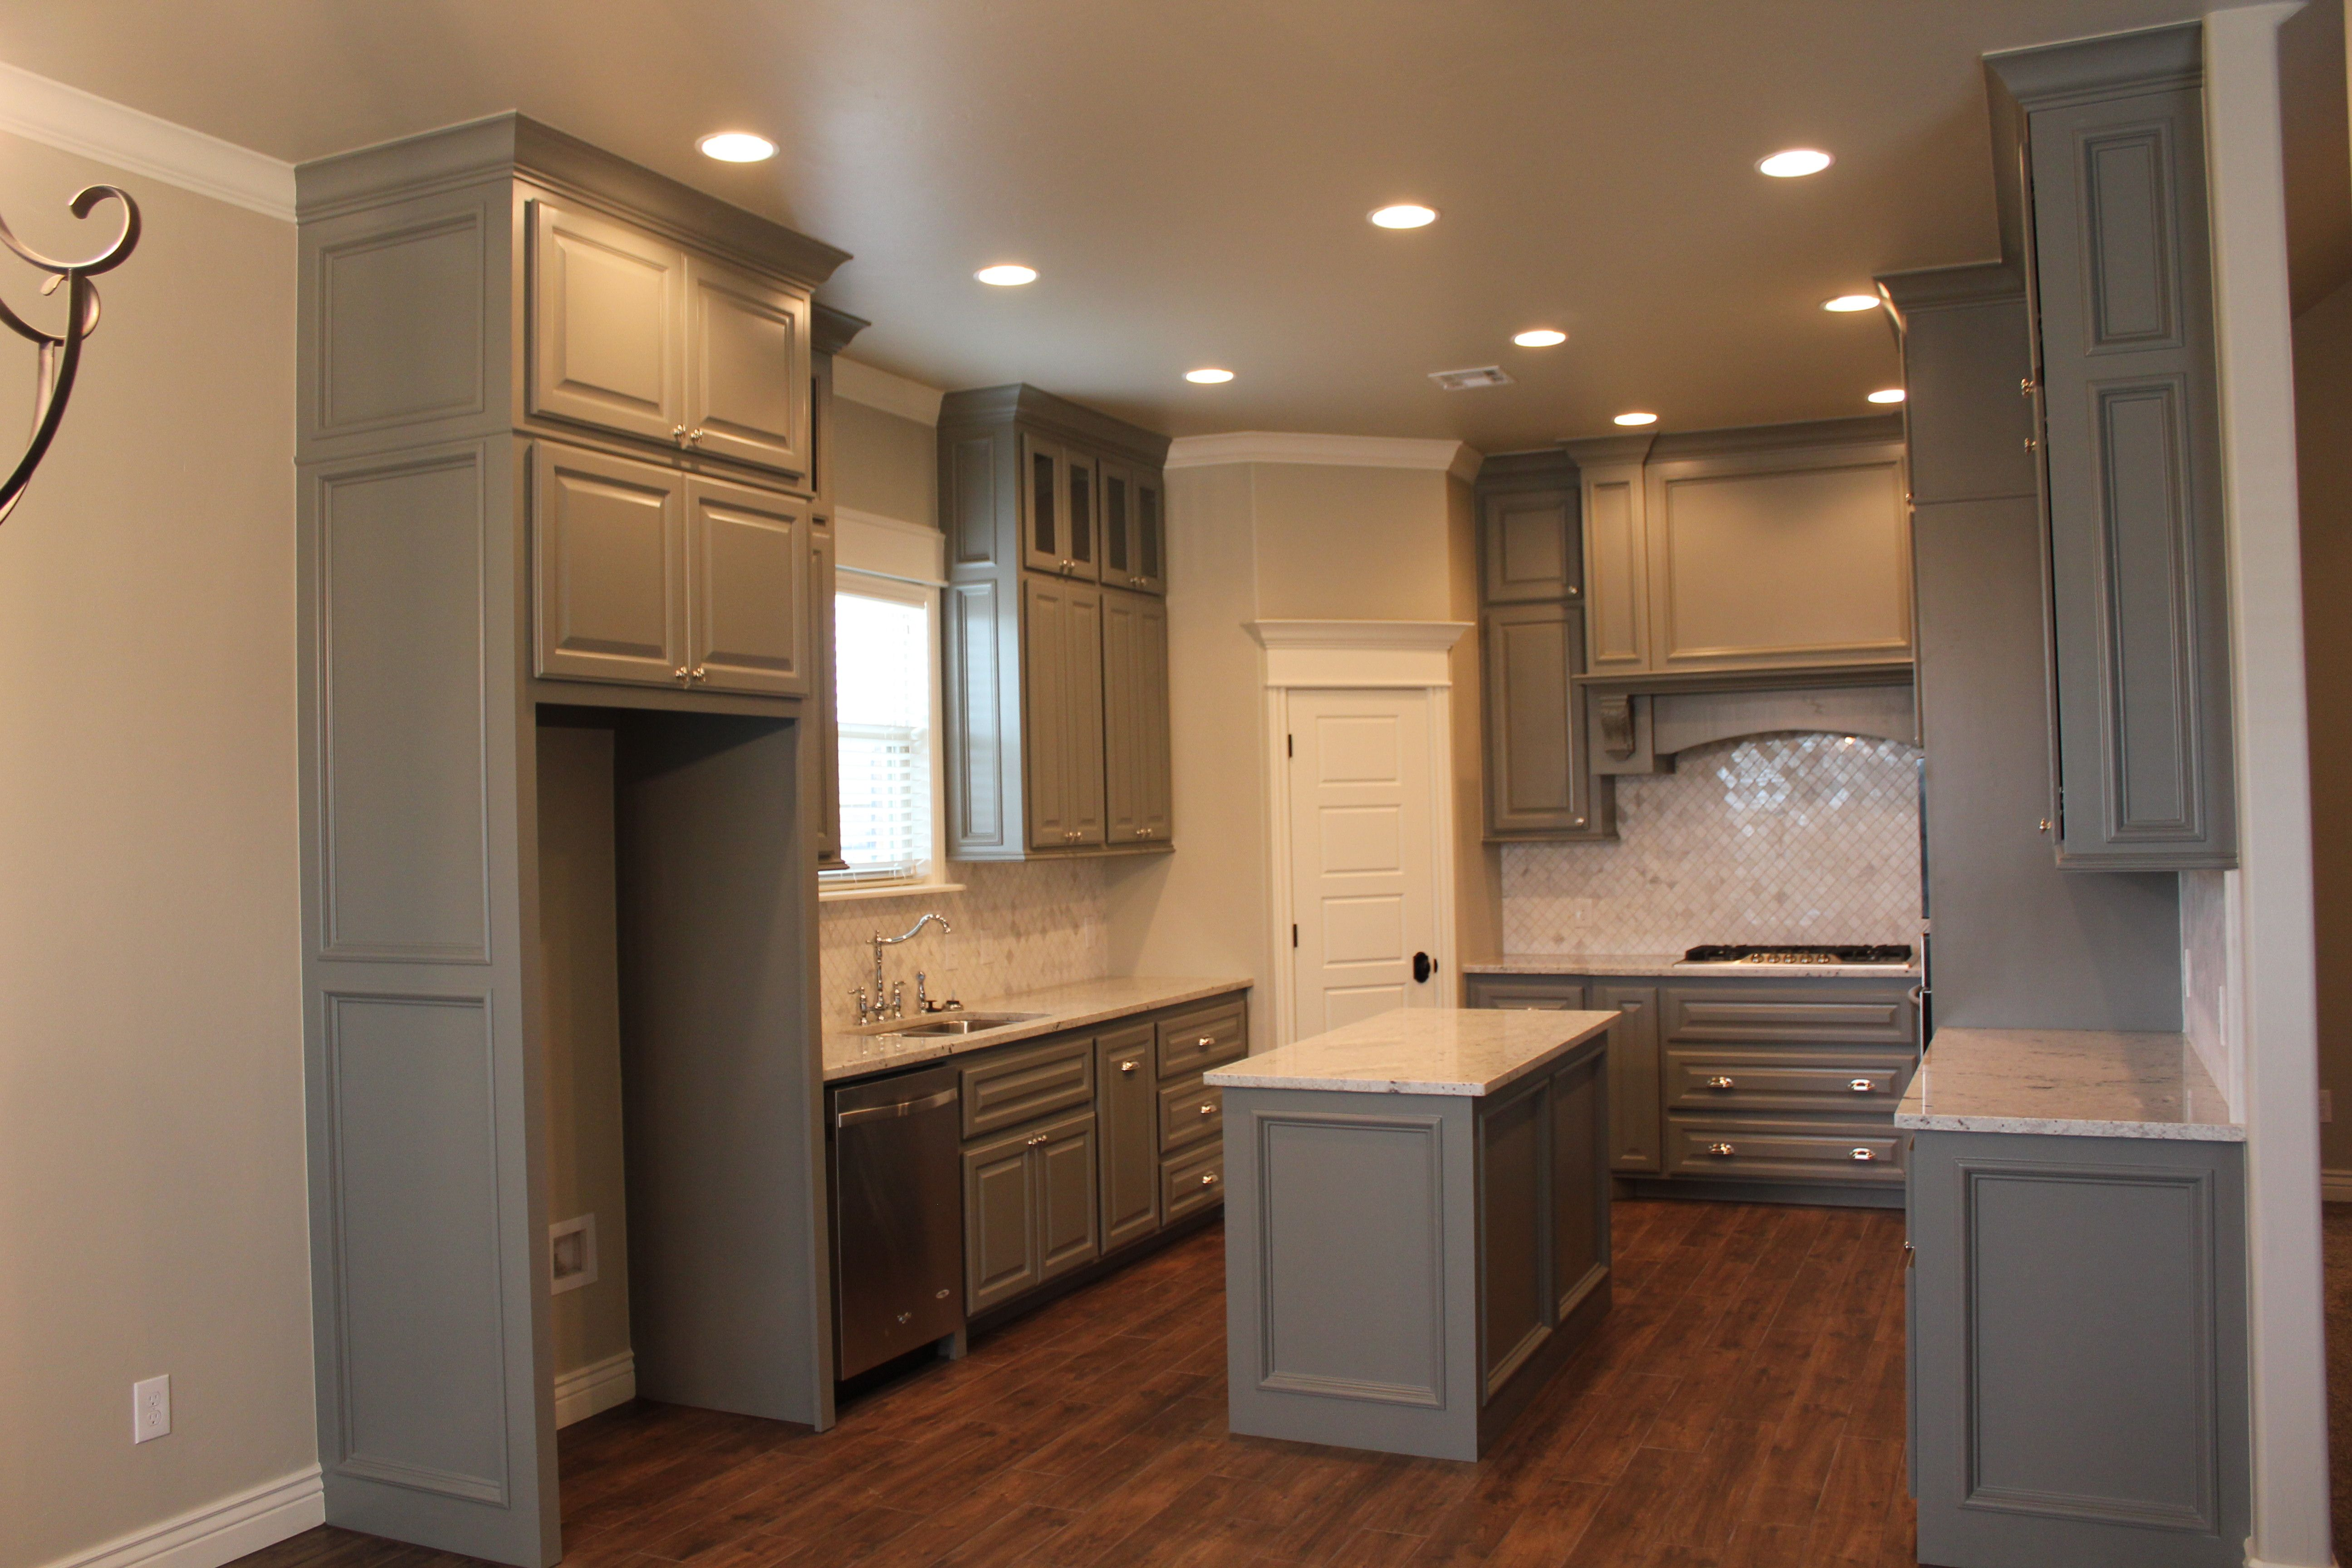 Beige Kitchen Cabinets Oakley Sink Backpack Stealth Black Bm Chelsea Gray Sw Accessible Walls